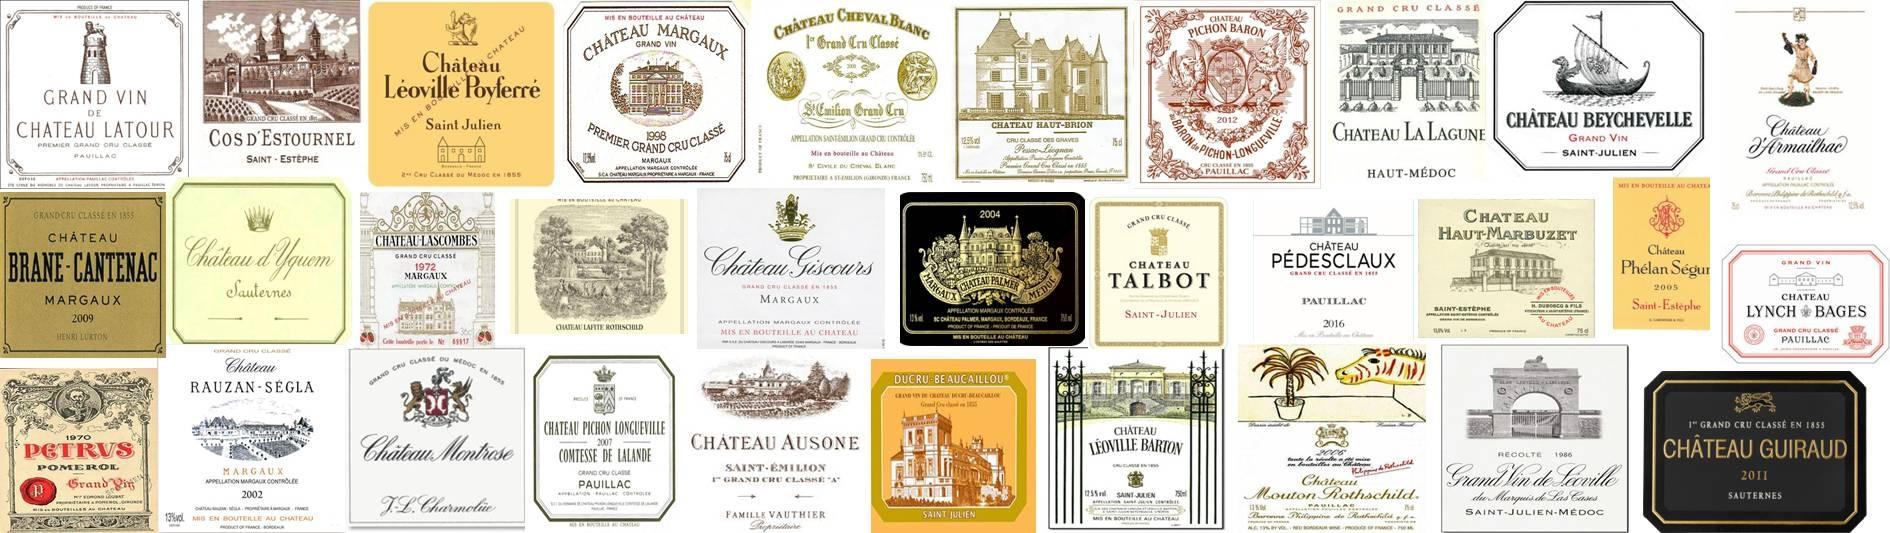 Les grands crus classés de Bordeaux